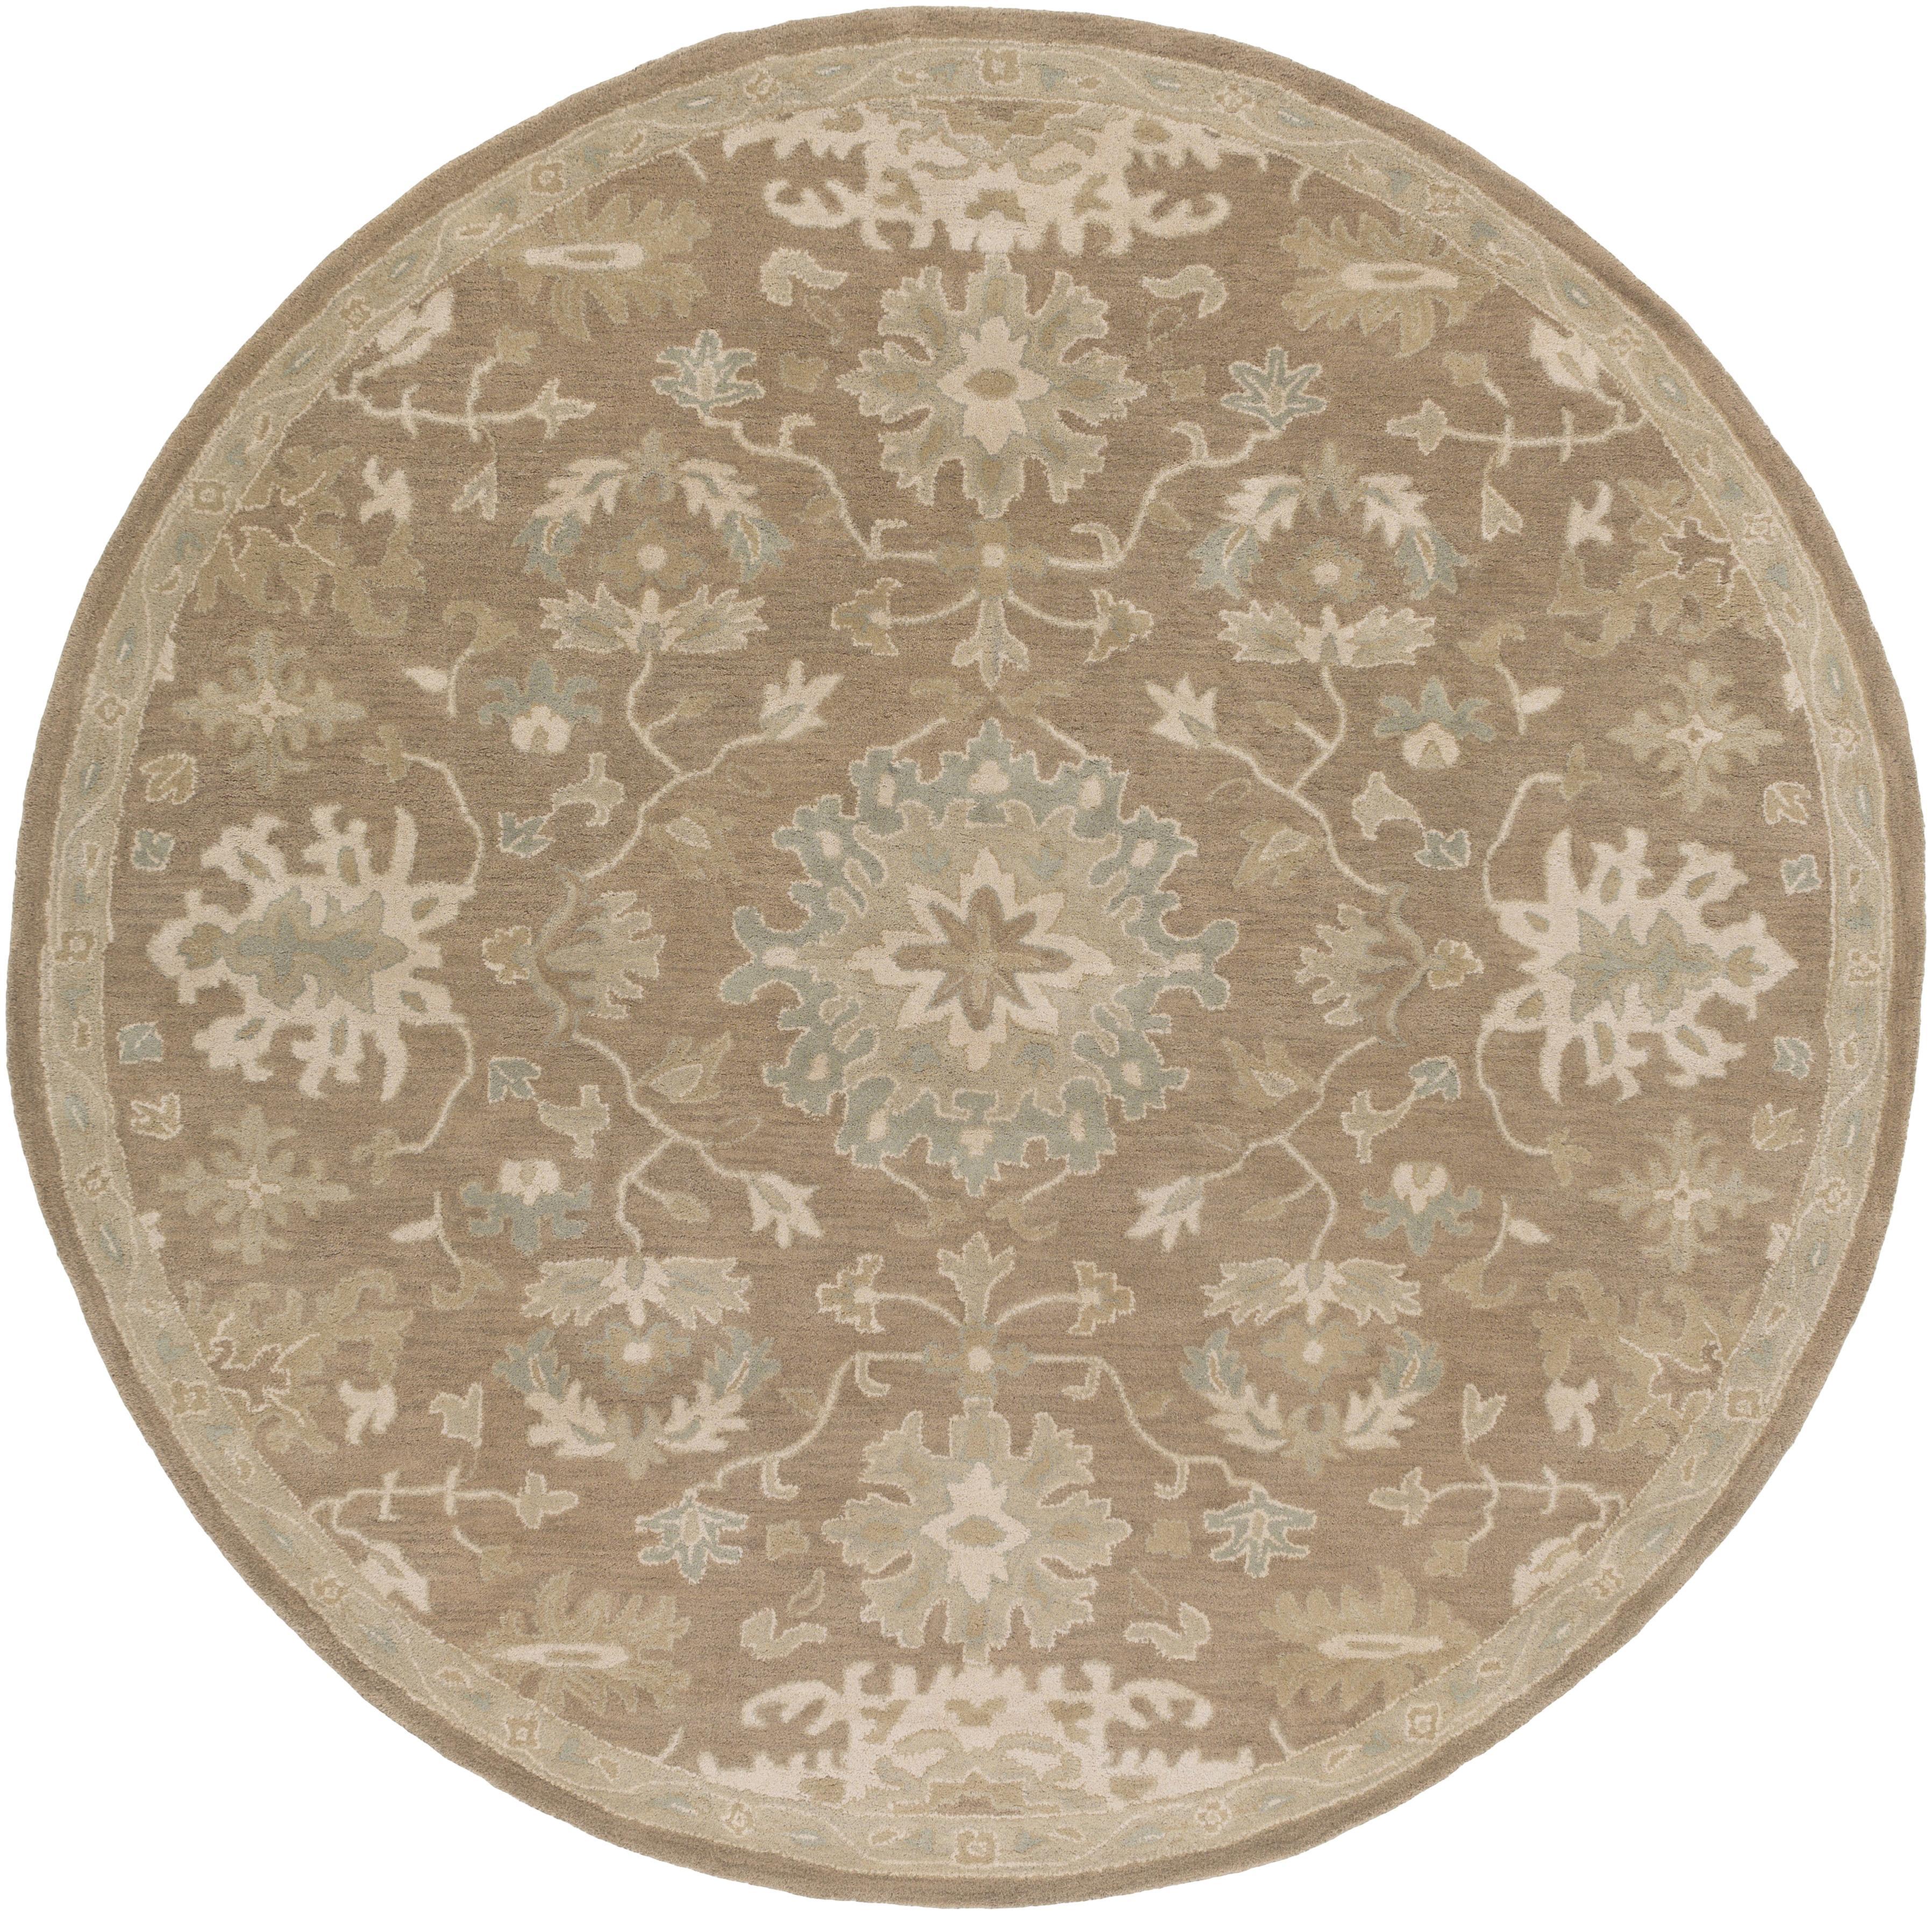 Oriental Rugs Hagerstown Md: Wolf And Gardiner Wolf Furniture